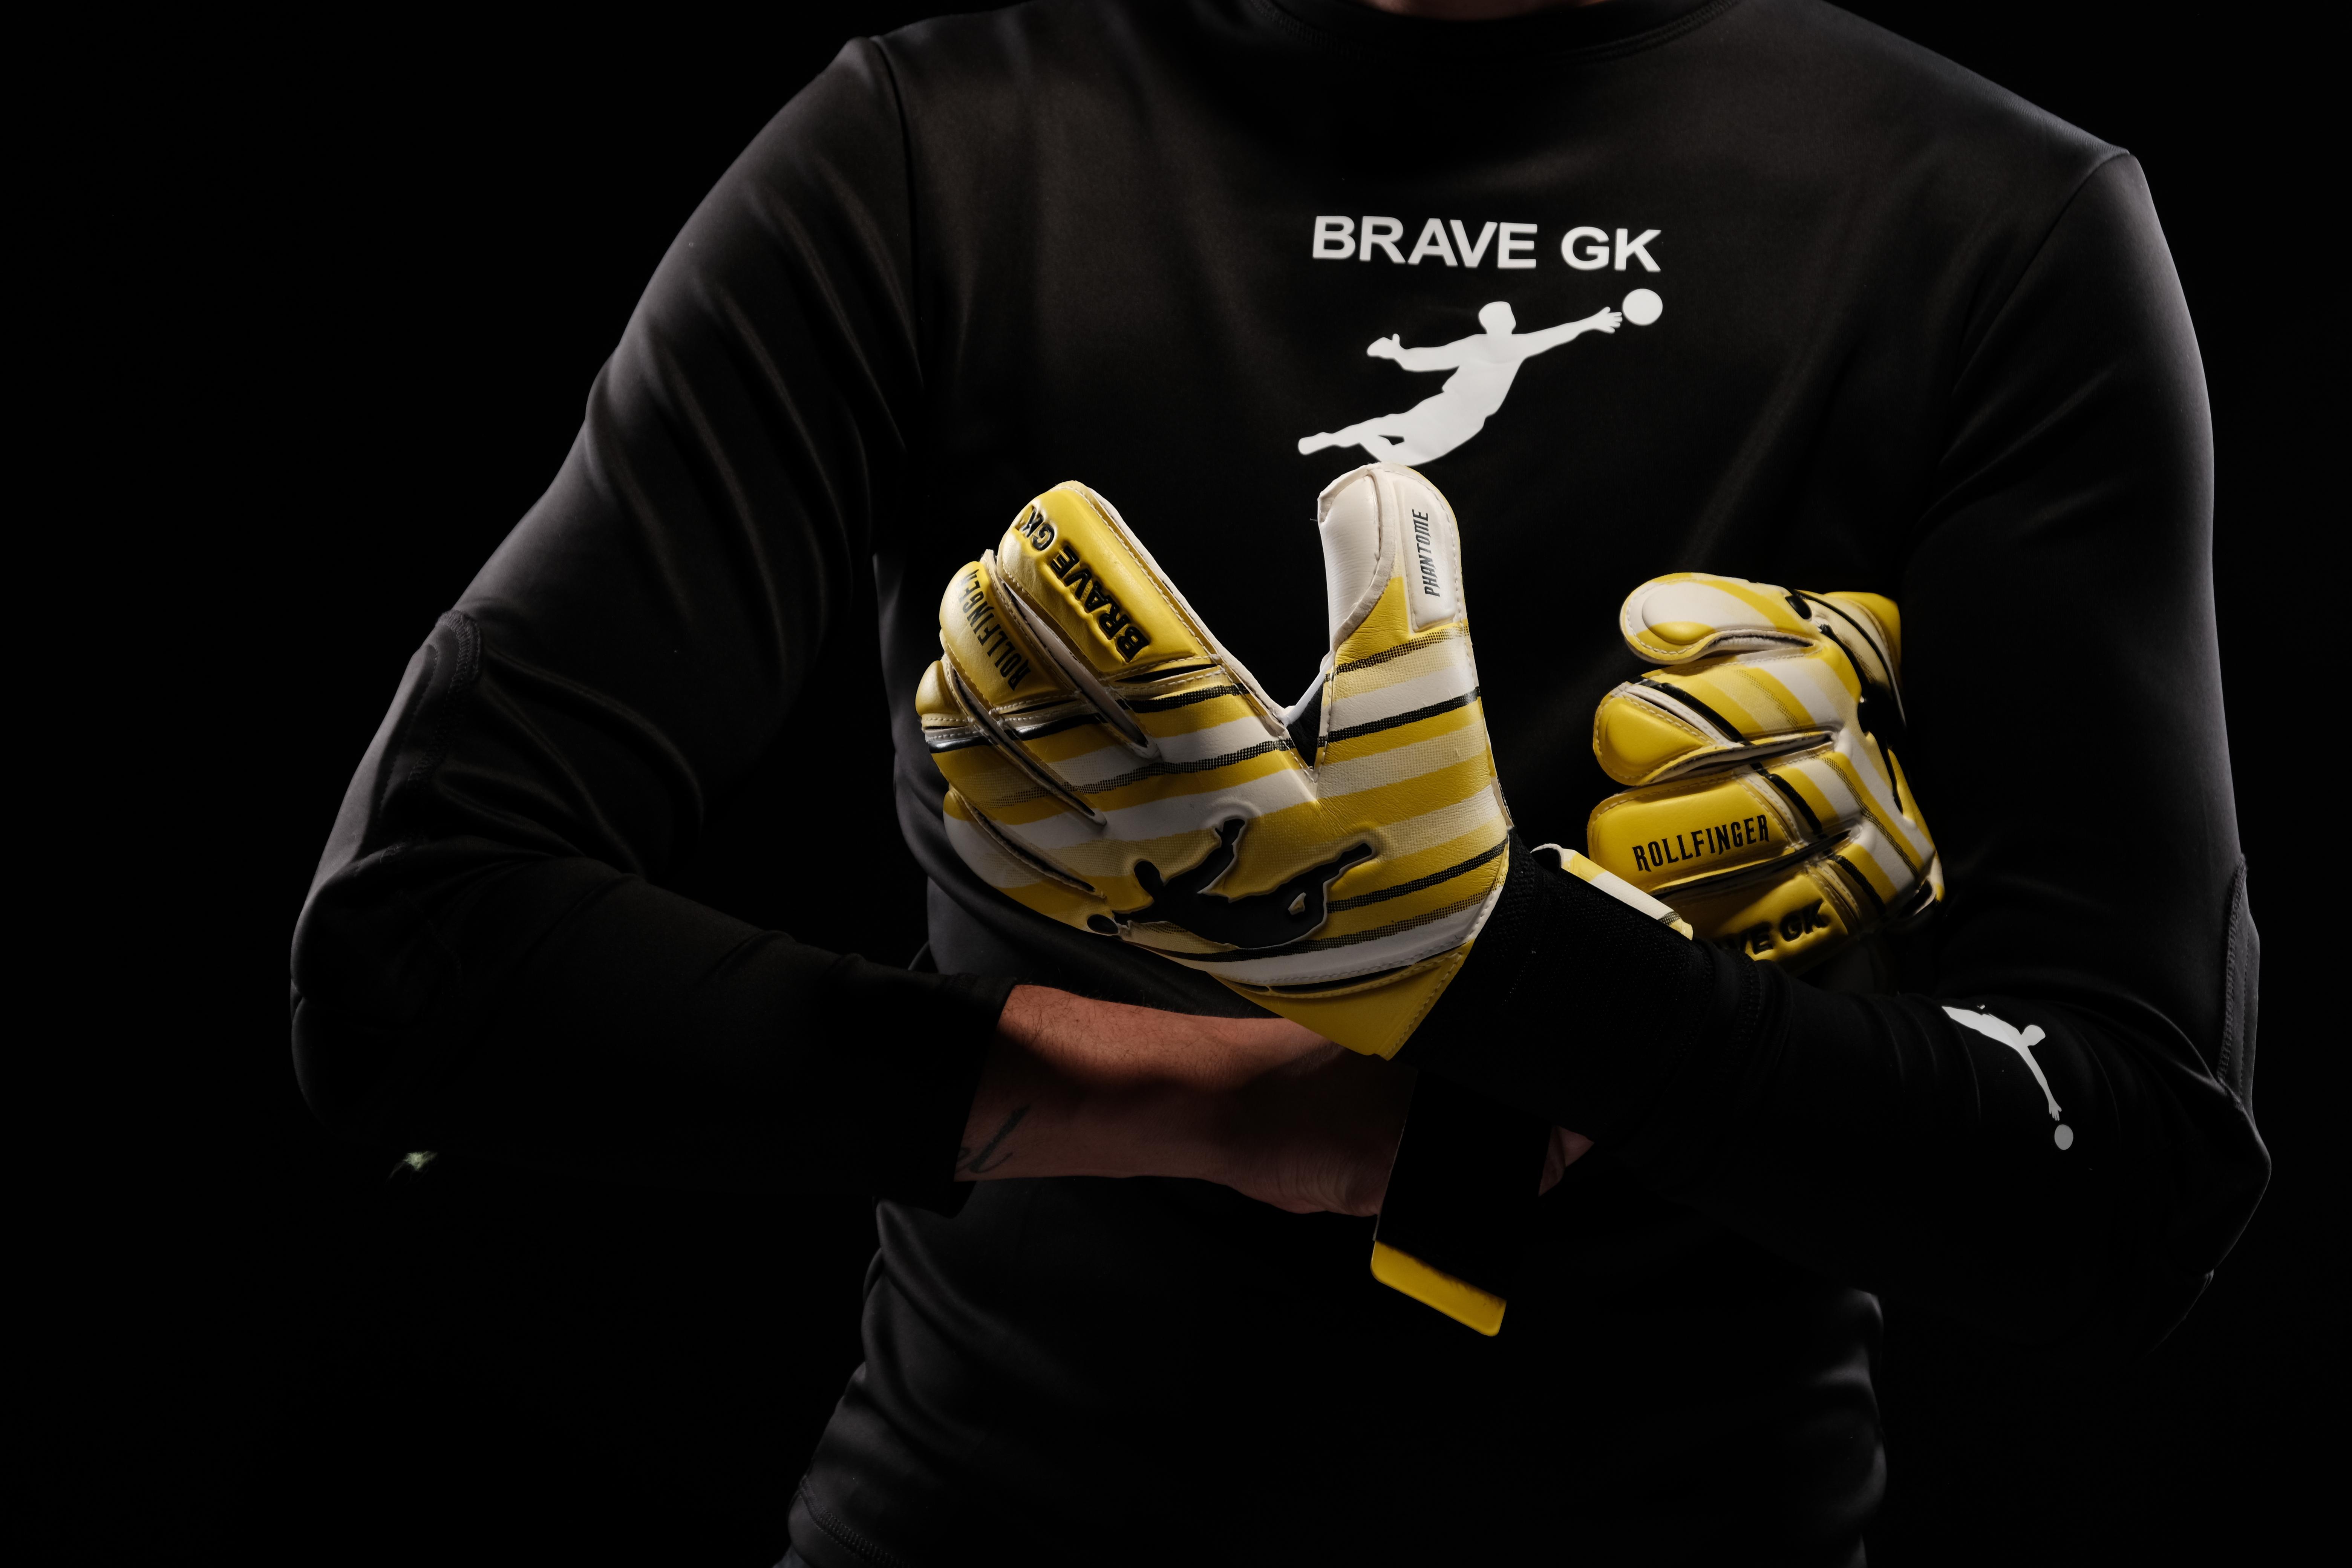 Goalkeeper thermal underwear Brave GK official online store Brave GK